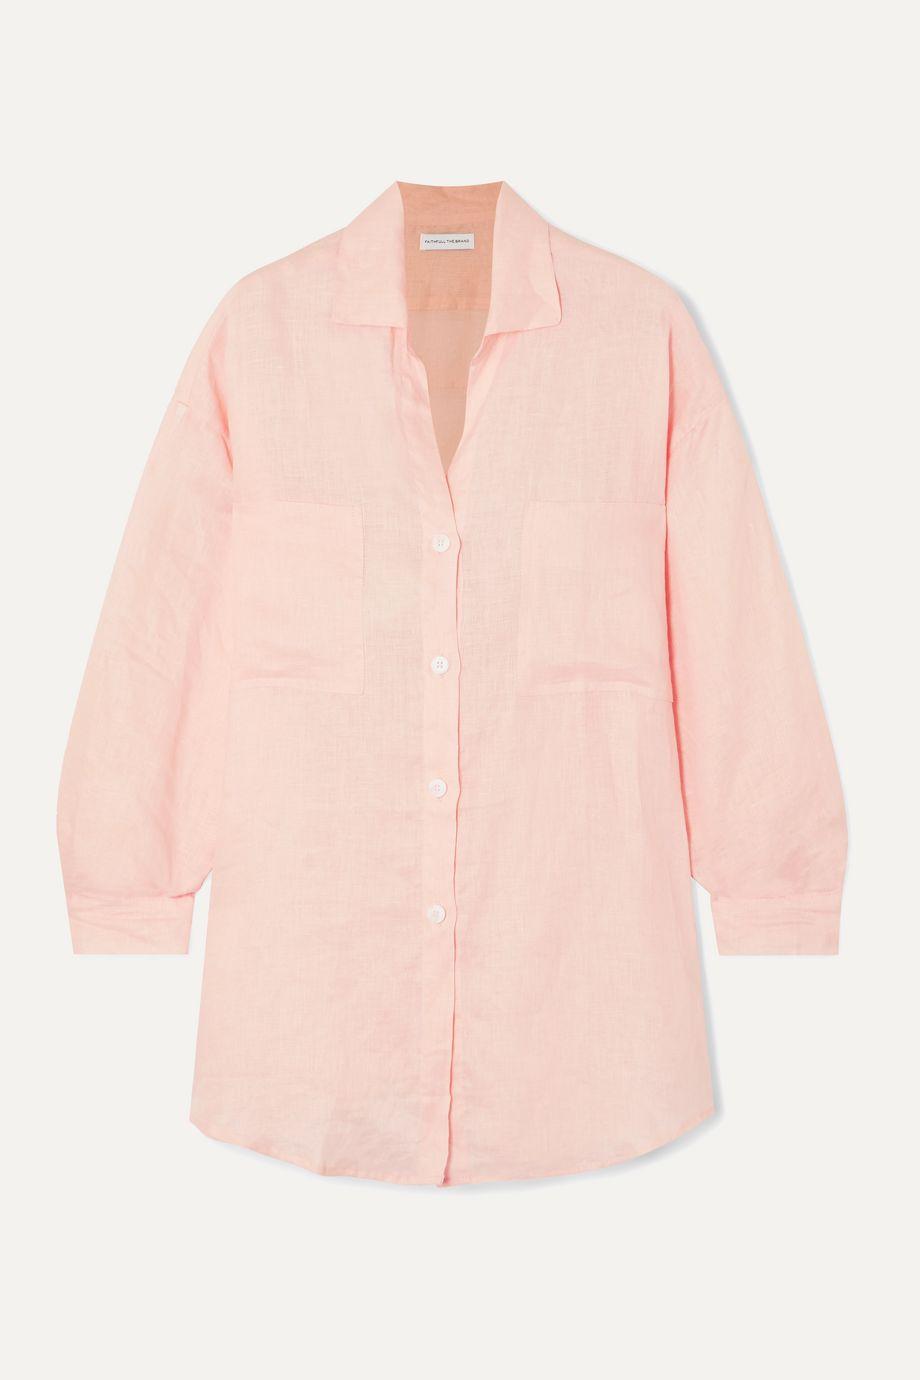 Faithfull The Brand Marbella cotton-gauze shirt